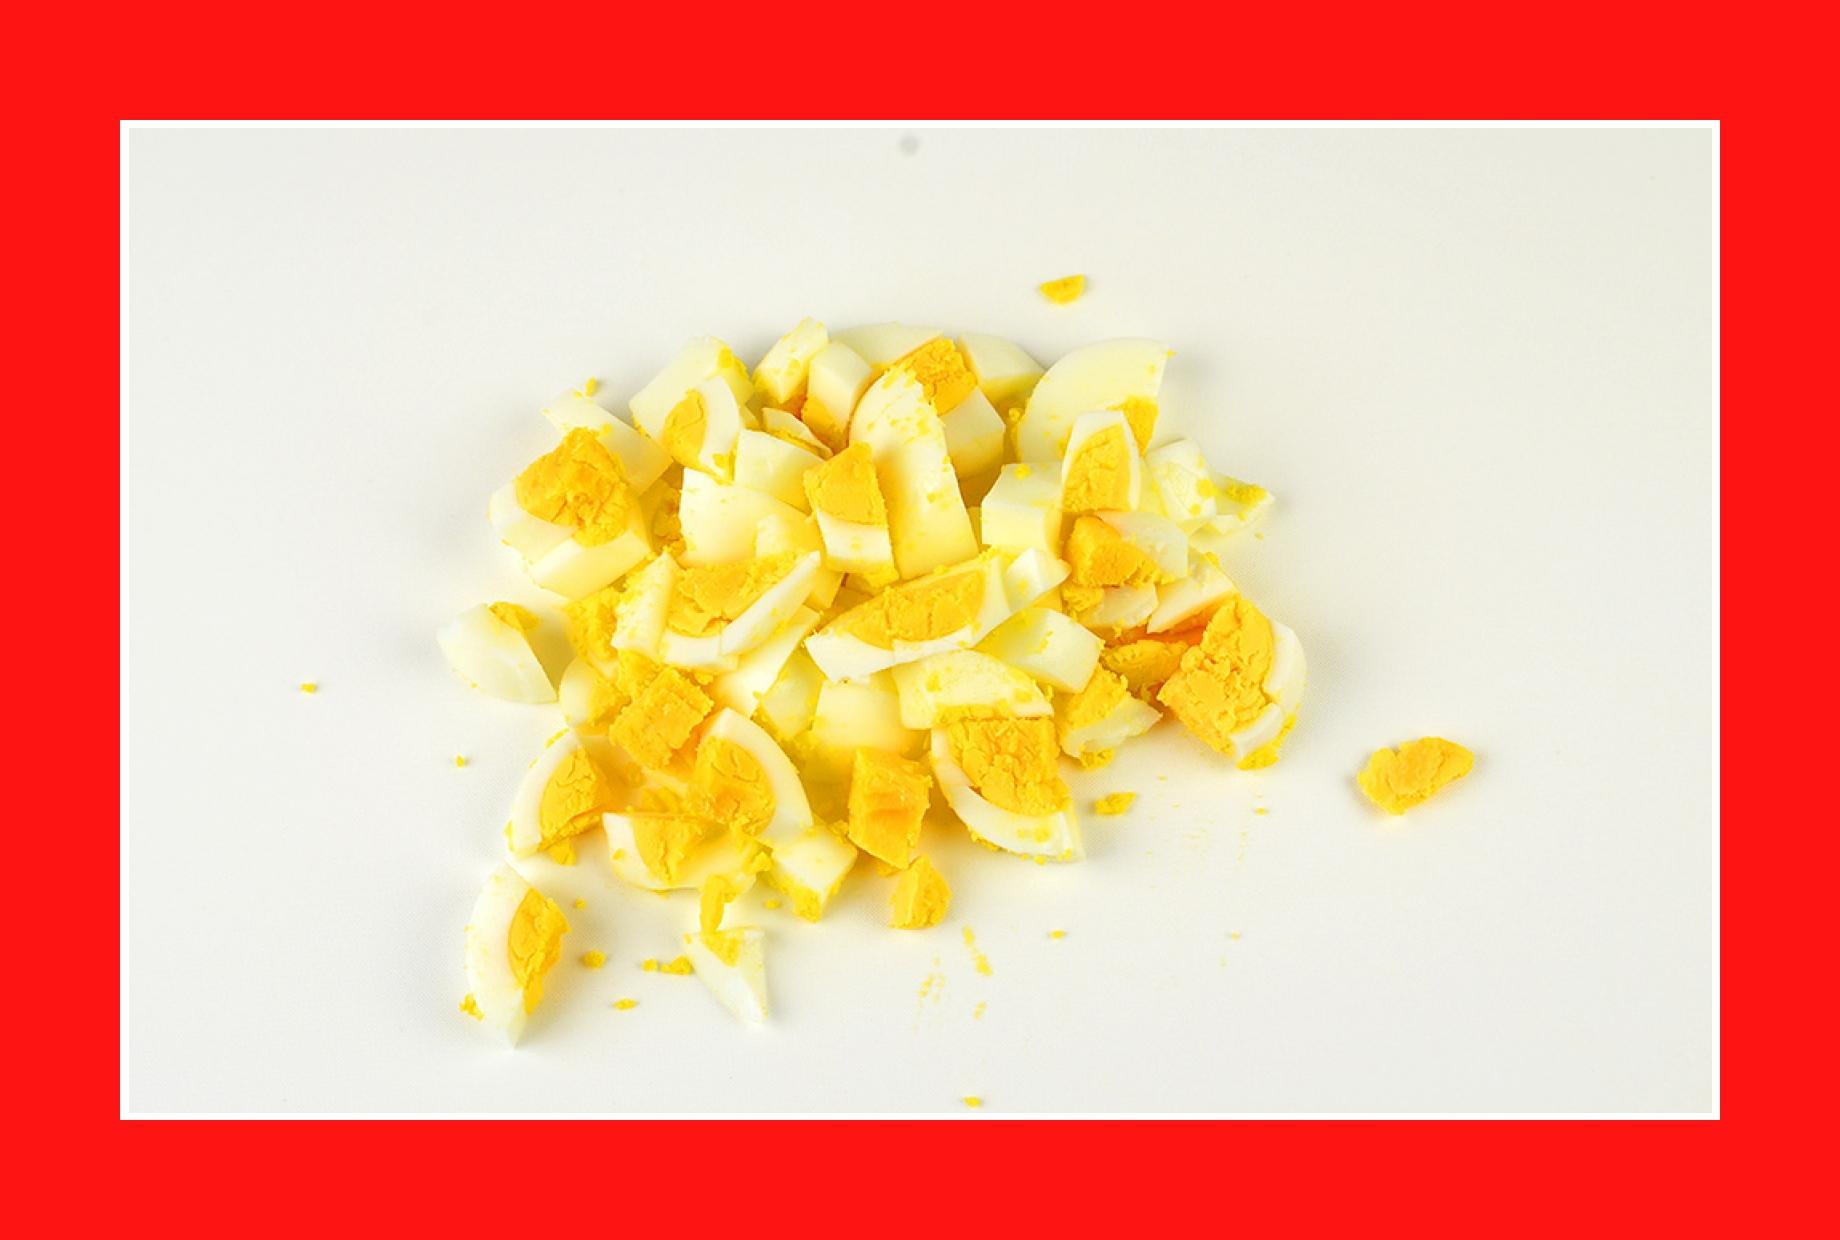 Eier für warmen Salat Kartoffelsalat